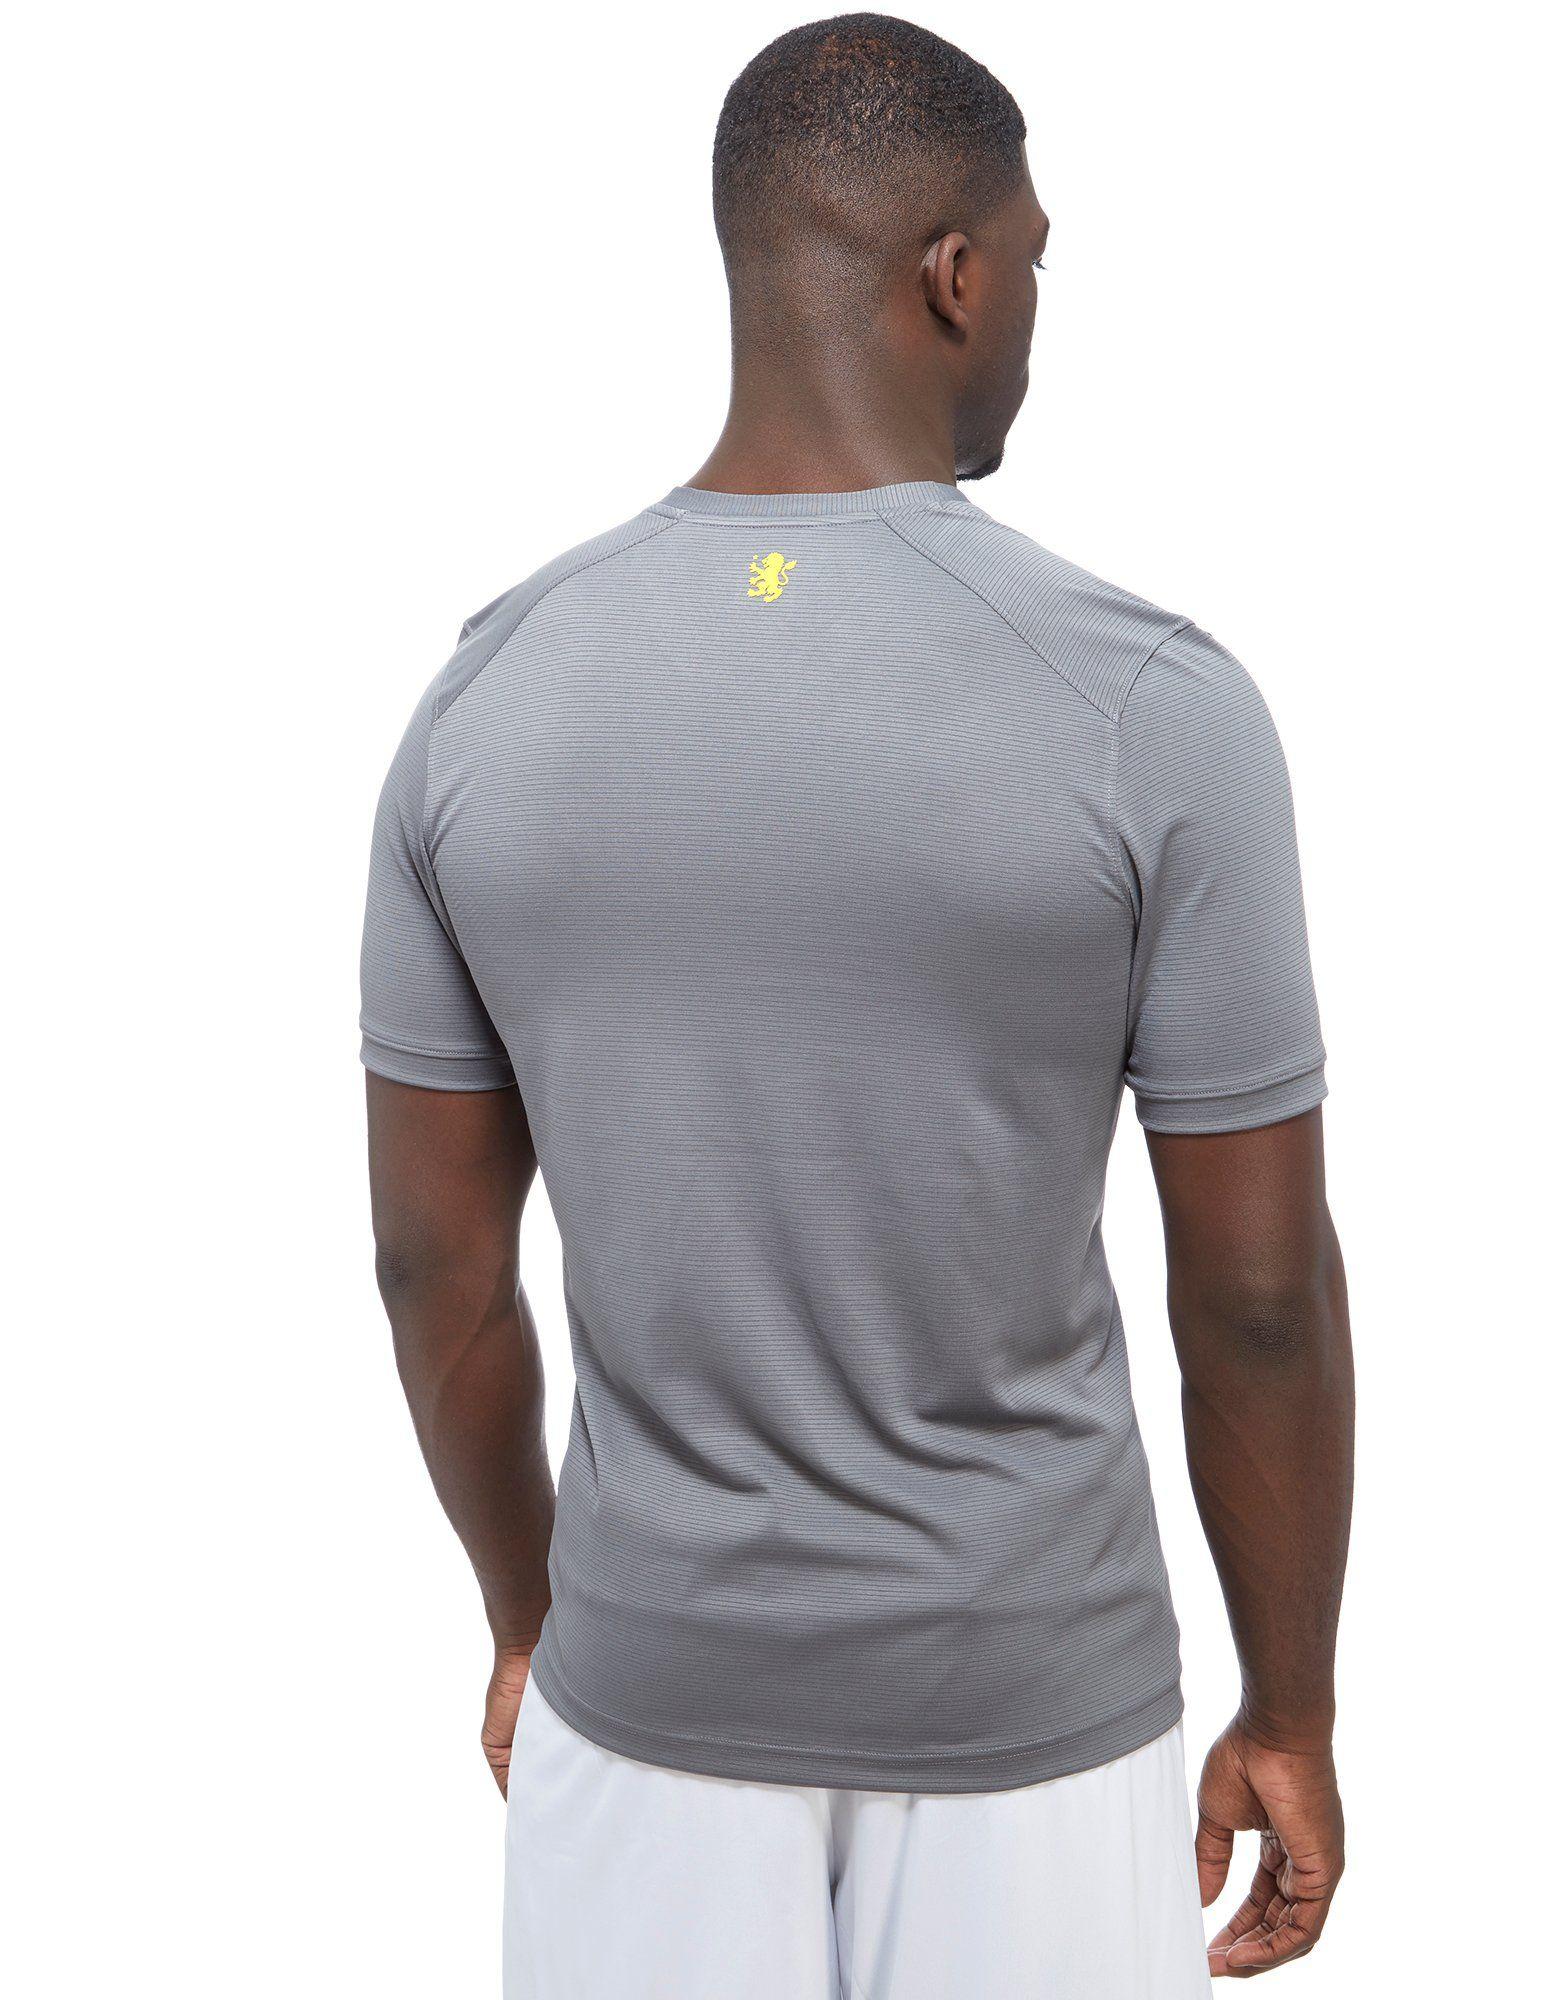 Under Armour Aston Villa 2017 Training T-Shirt